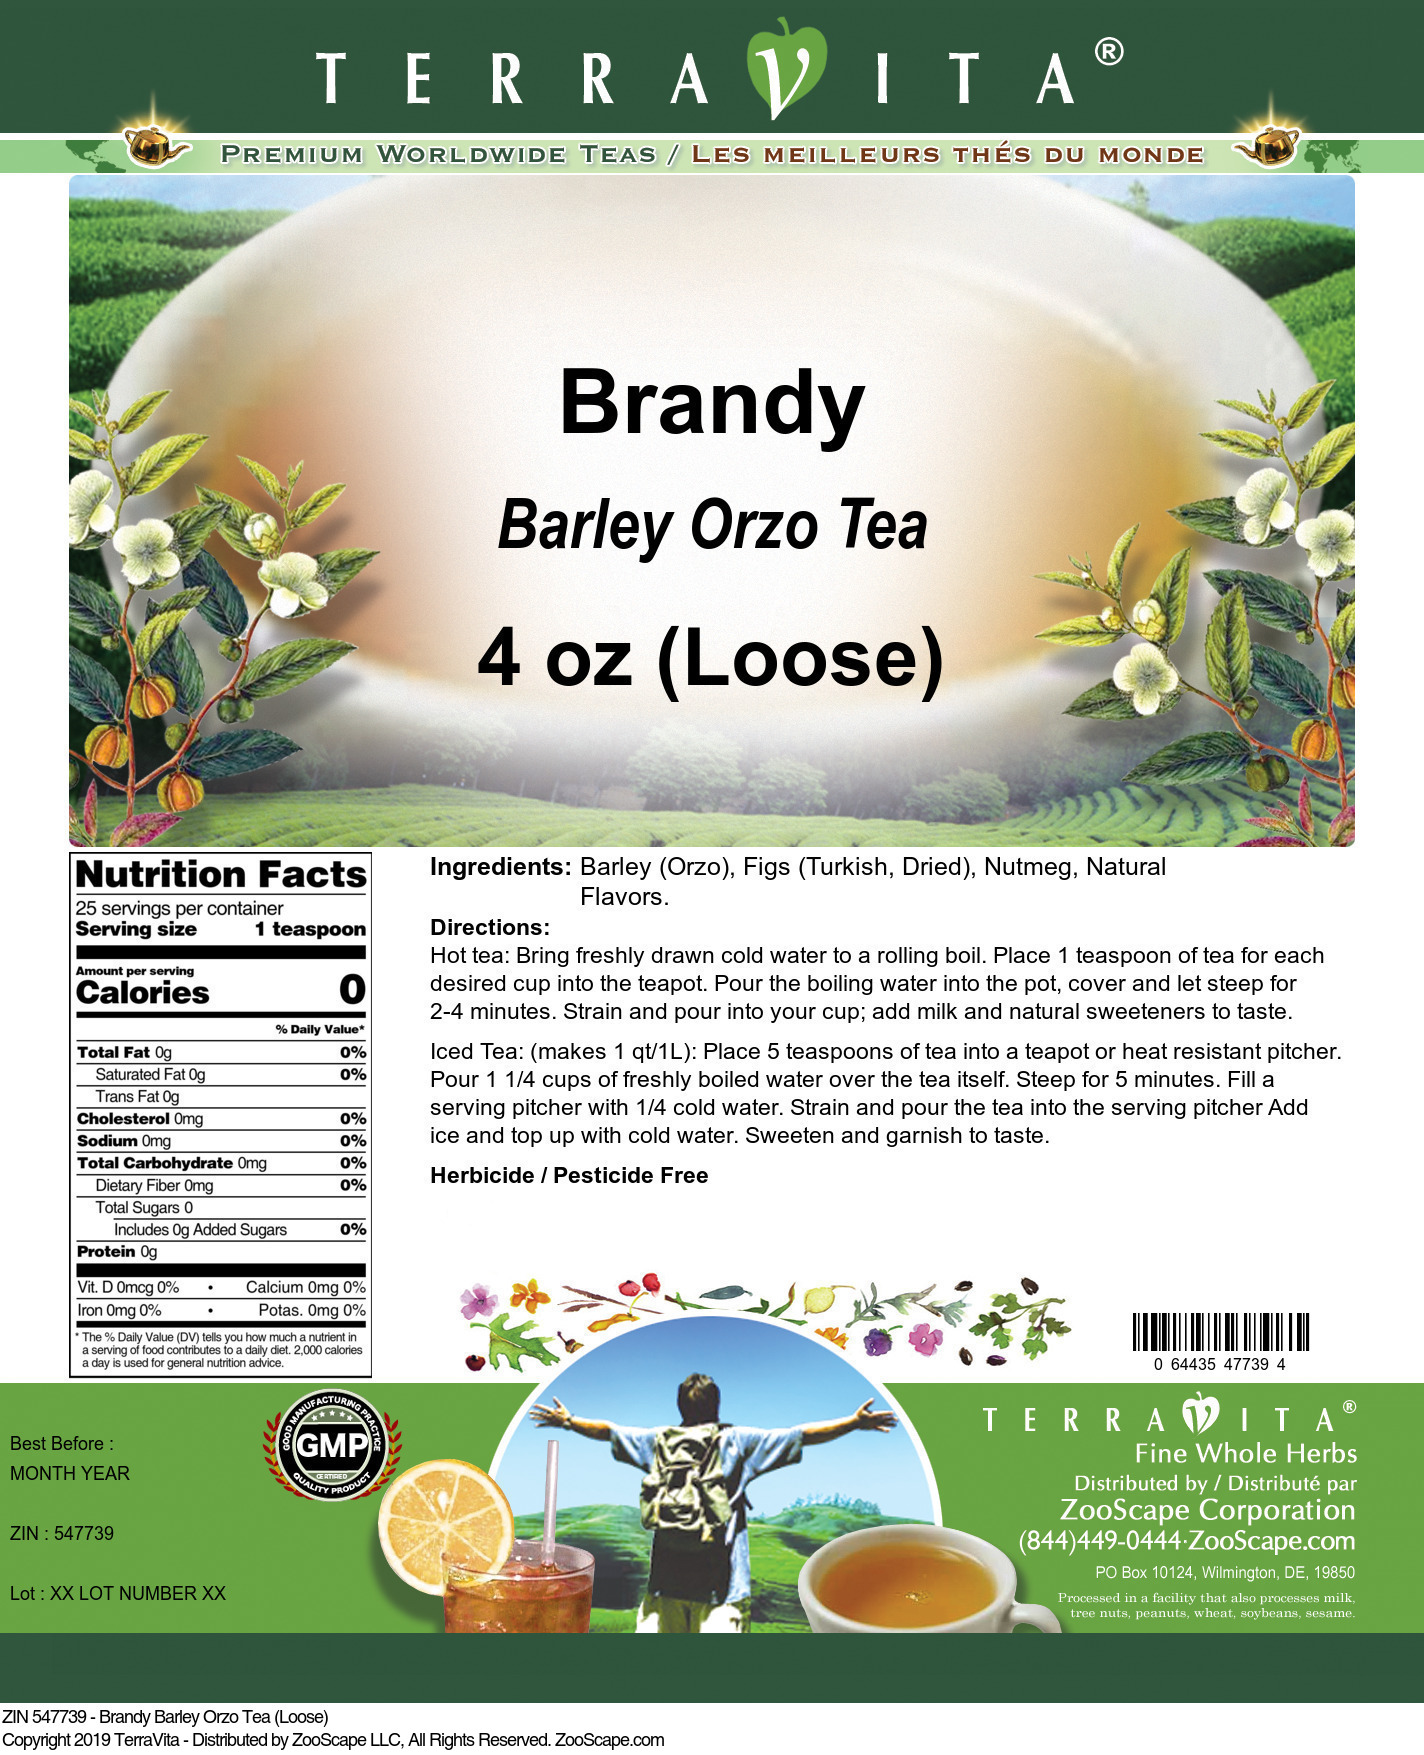 Brandy Barley Orzo